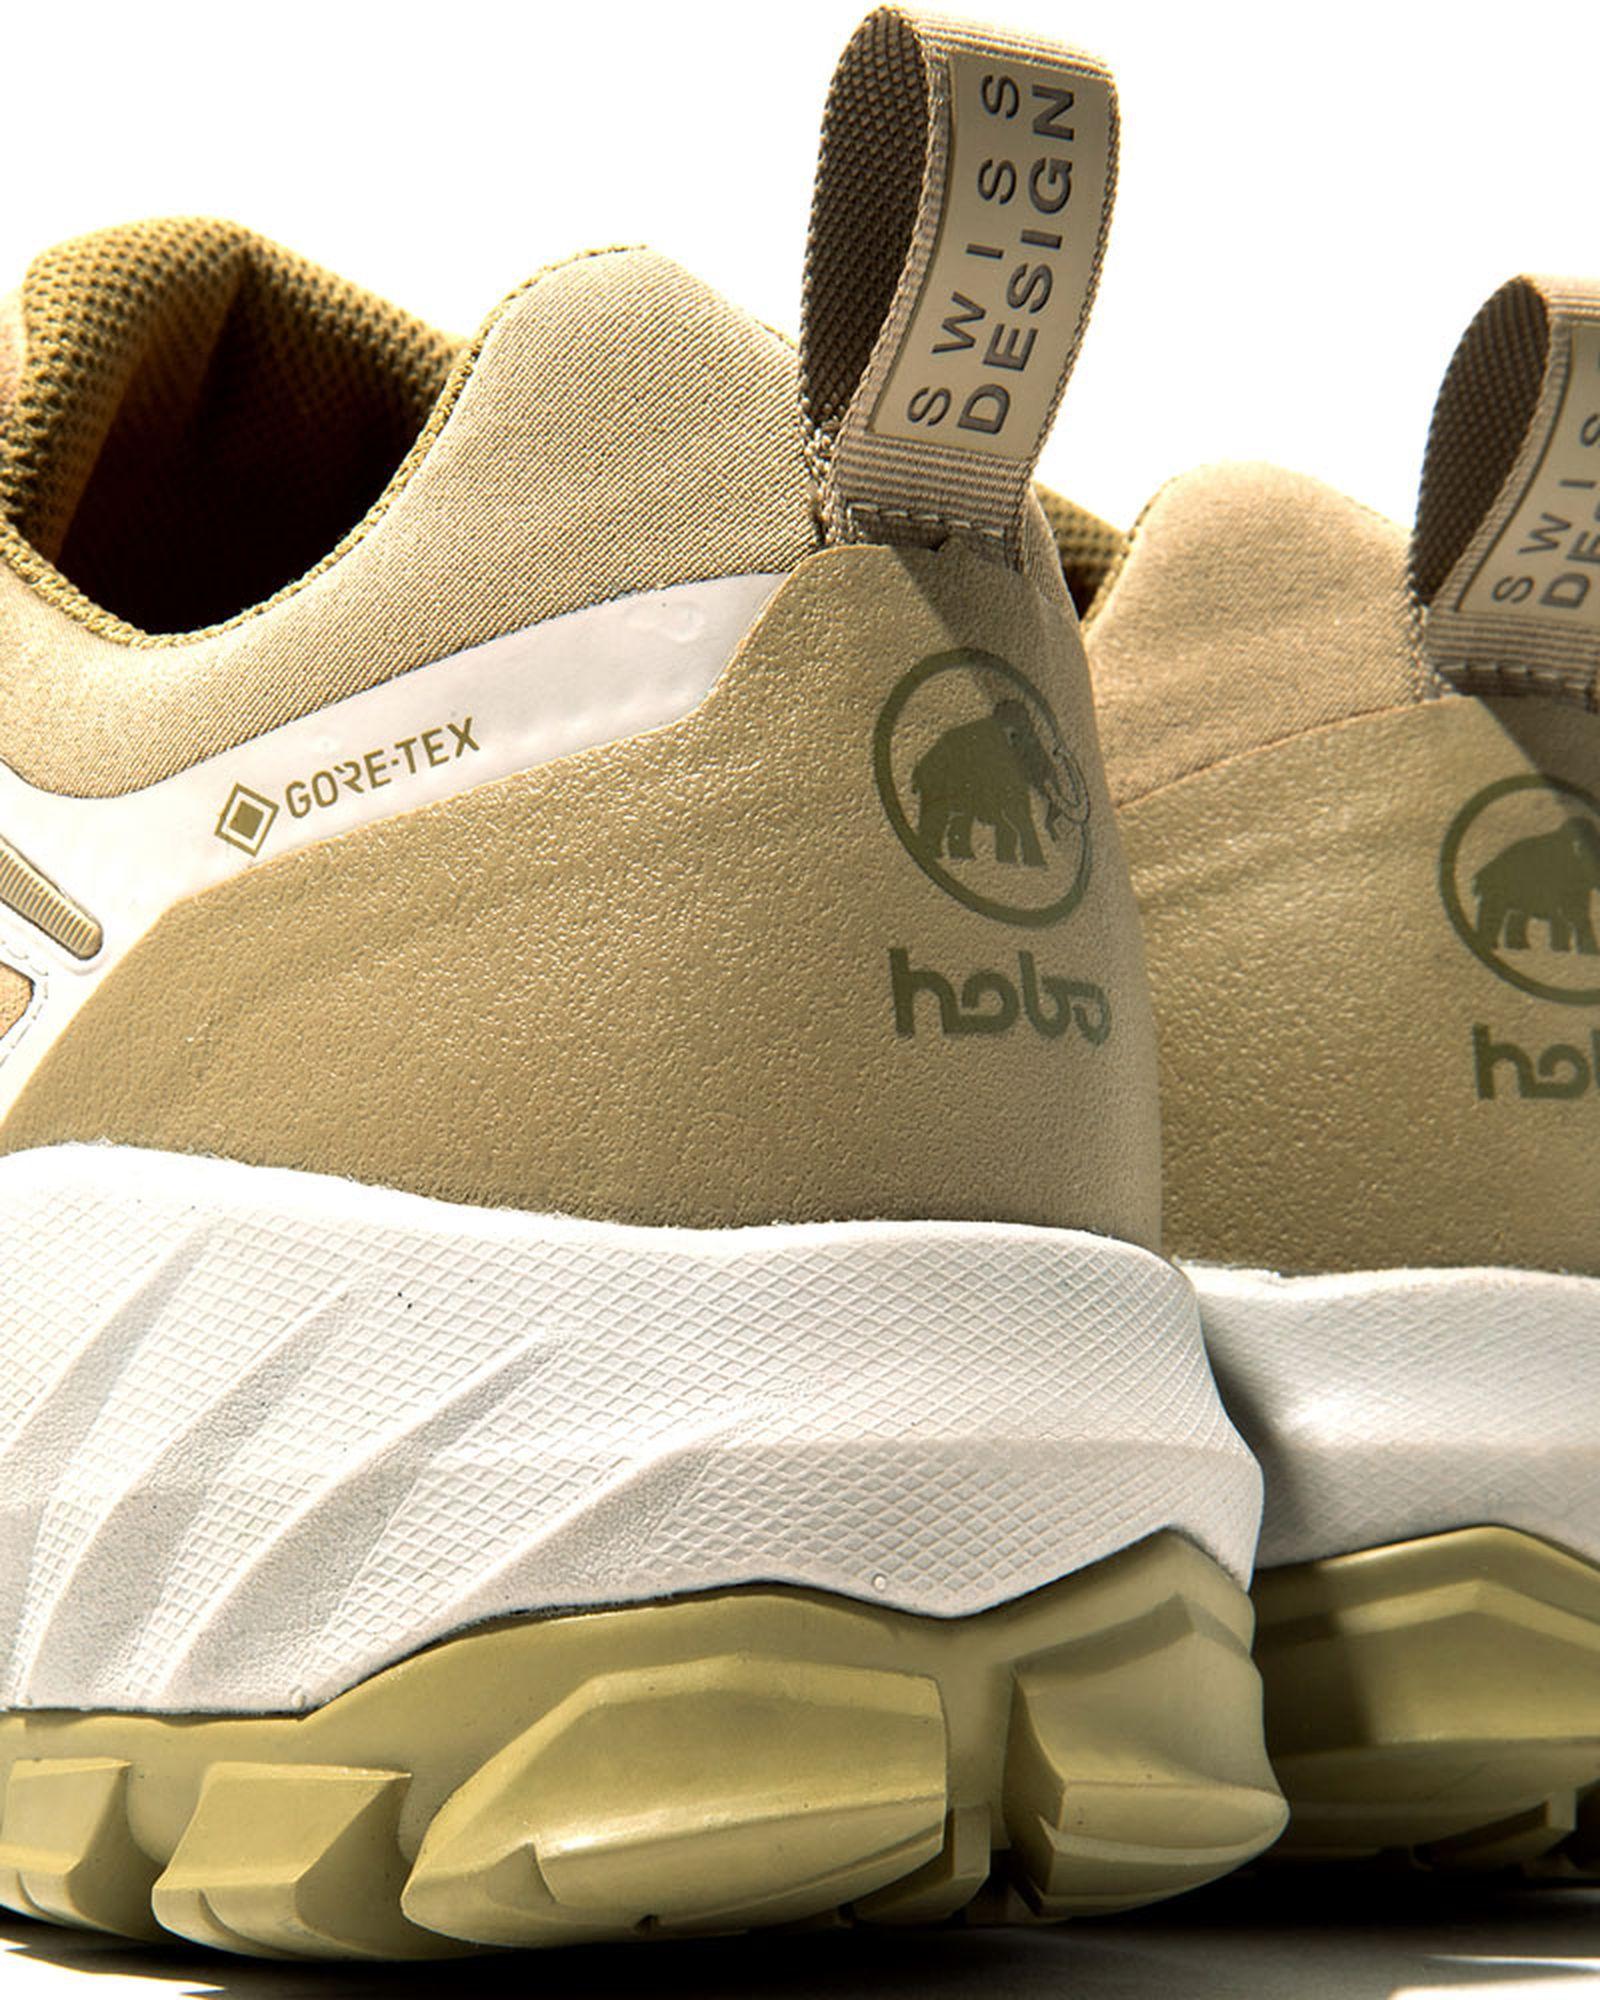 hobo-x-mammut-sapuen-low-gtx-release-info-date-price-03